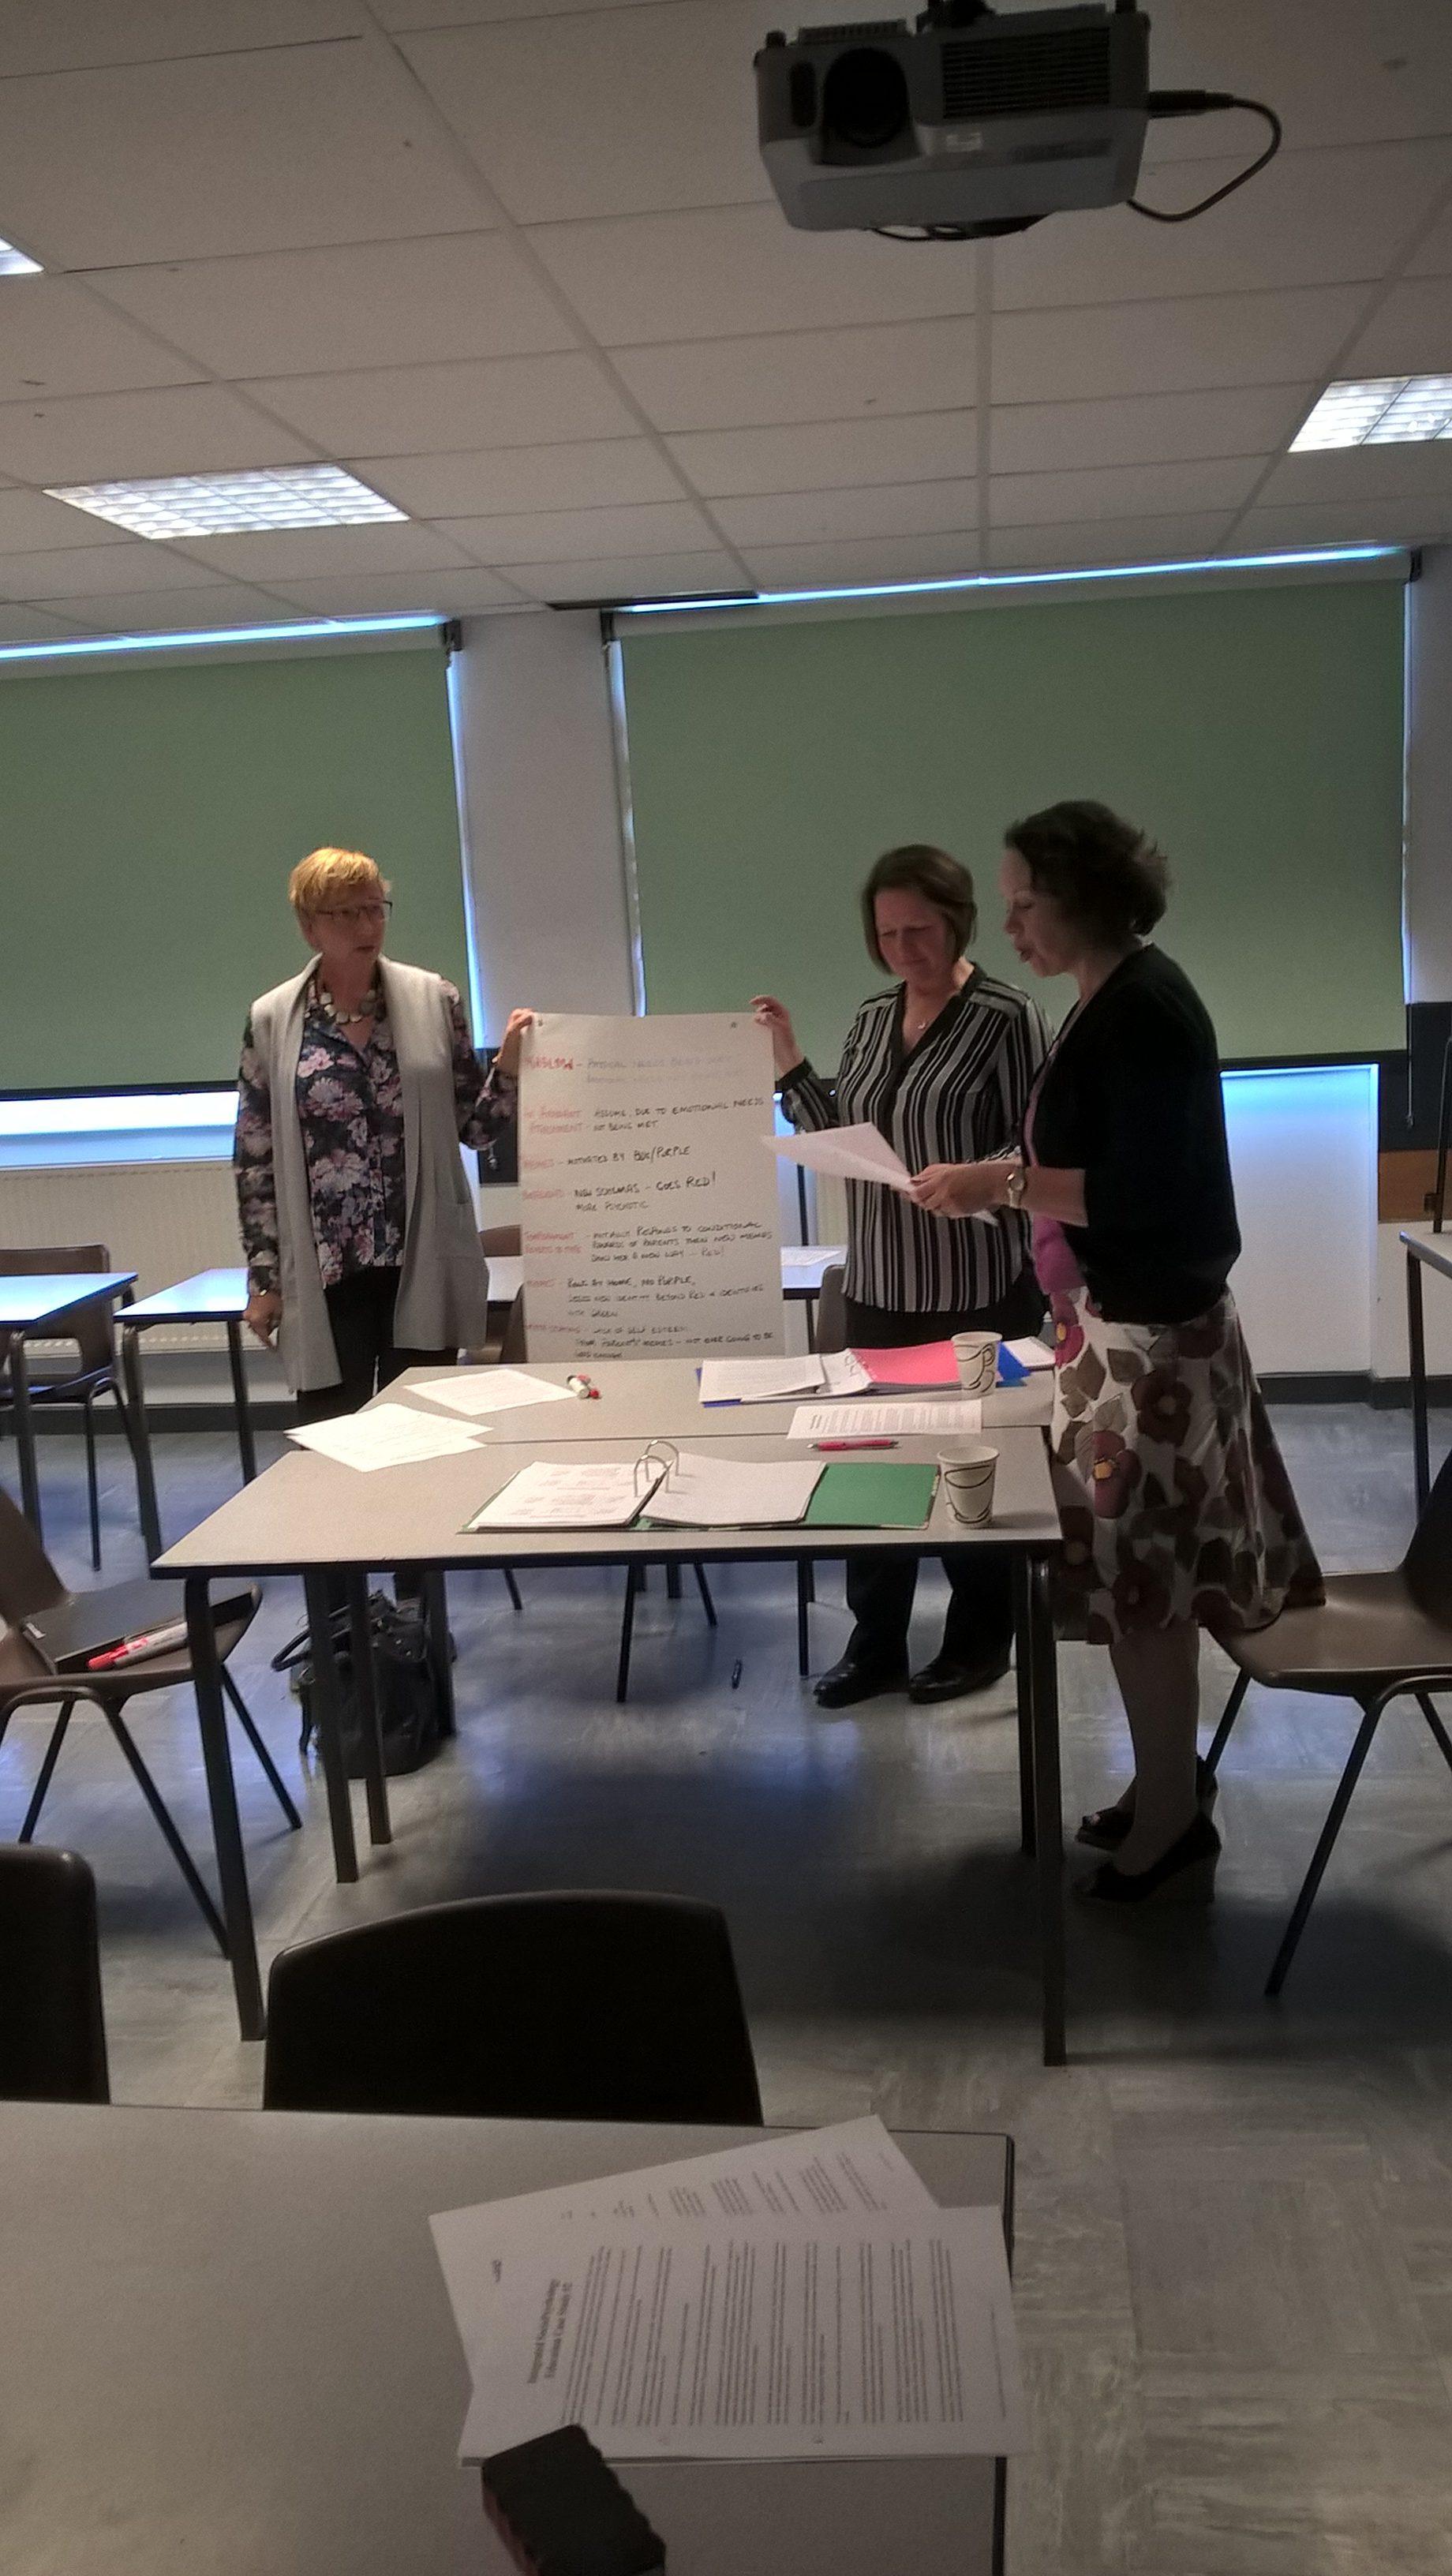 June 2016: Penny Wilson, Deborah Willams and Rebecca Warner presenting their case study at Rossett